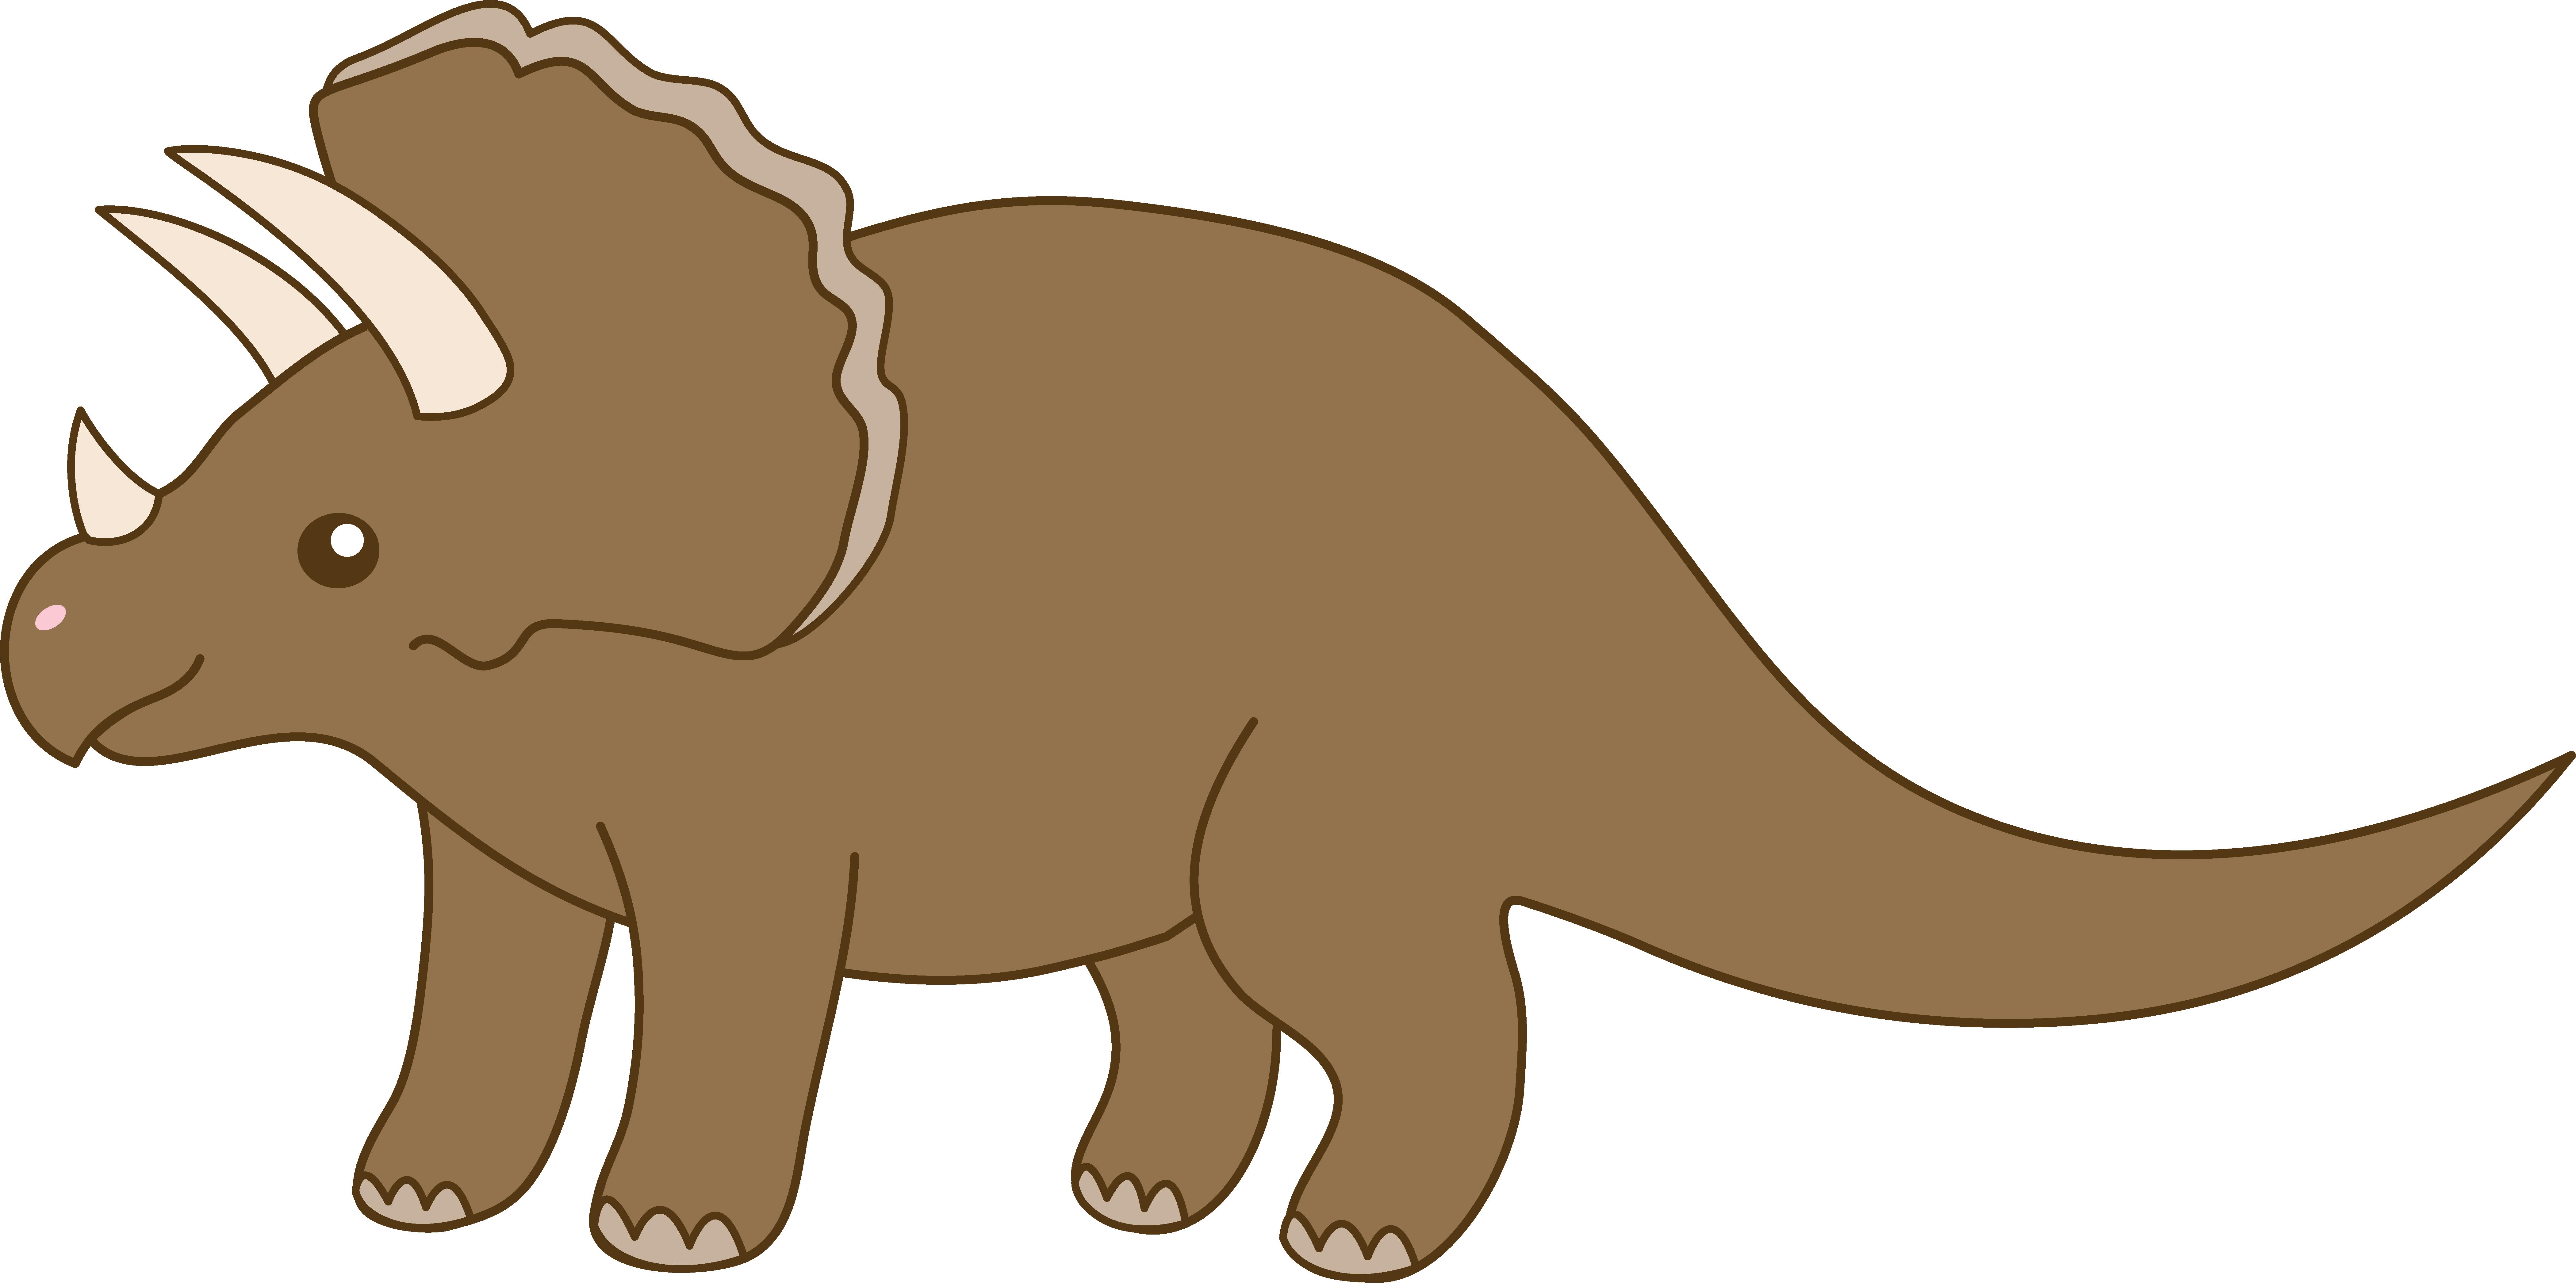 Dinosaurs clipart